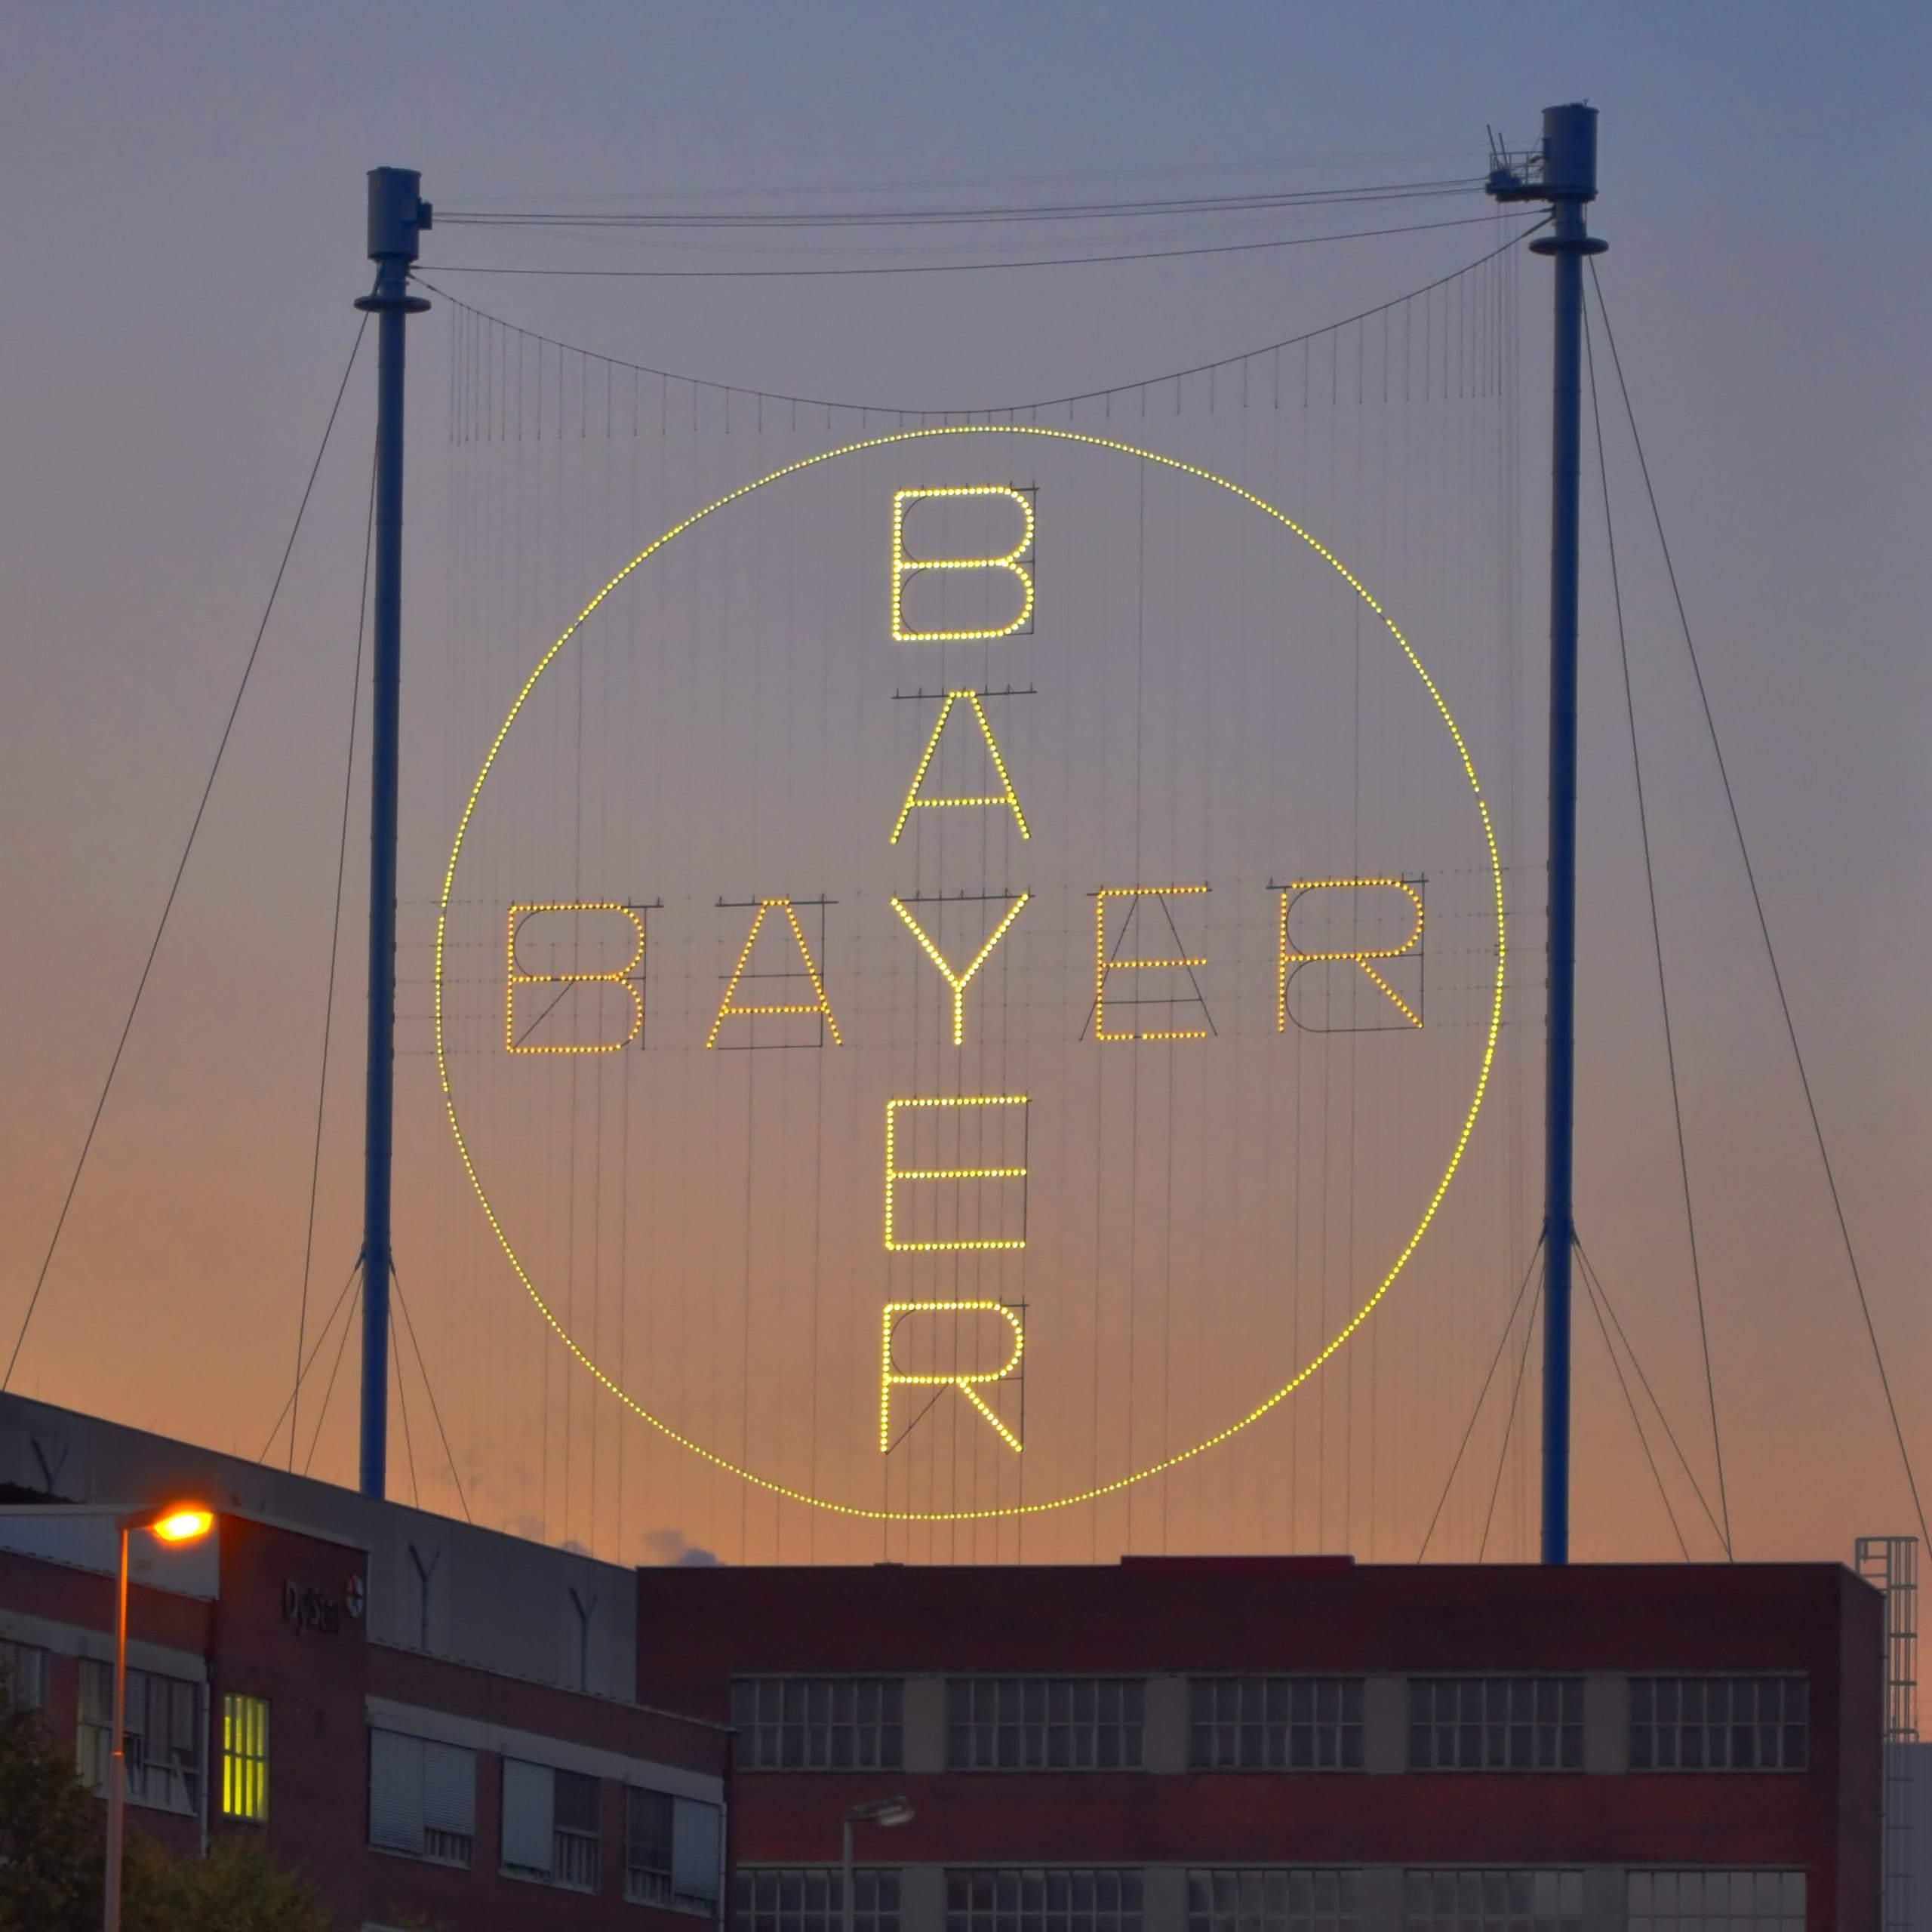 Das Bayer-Kreuz